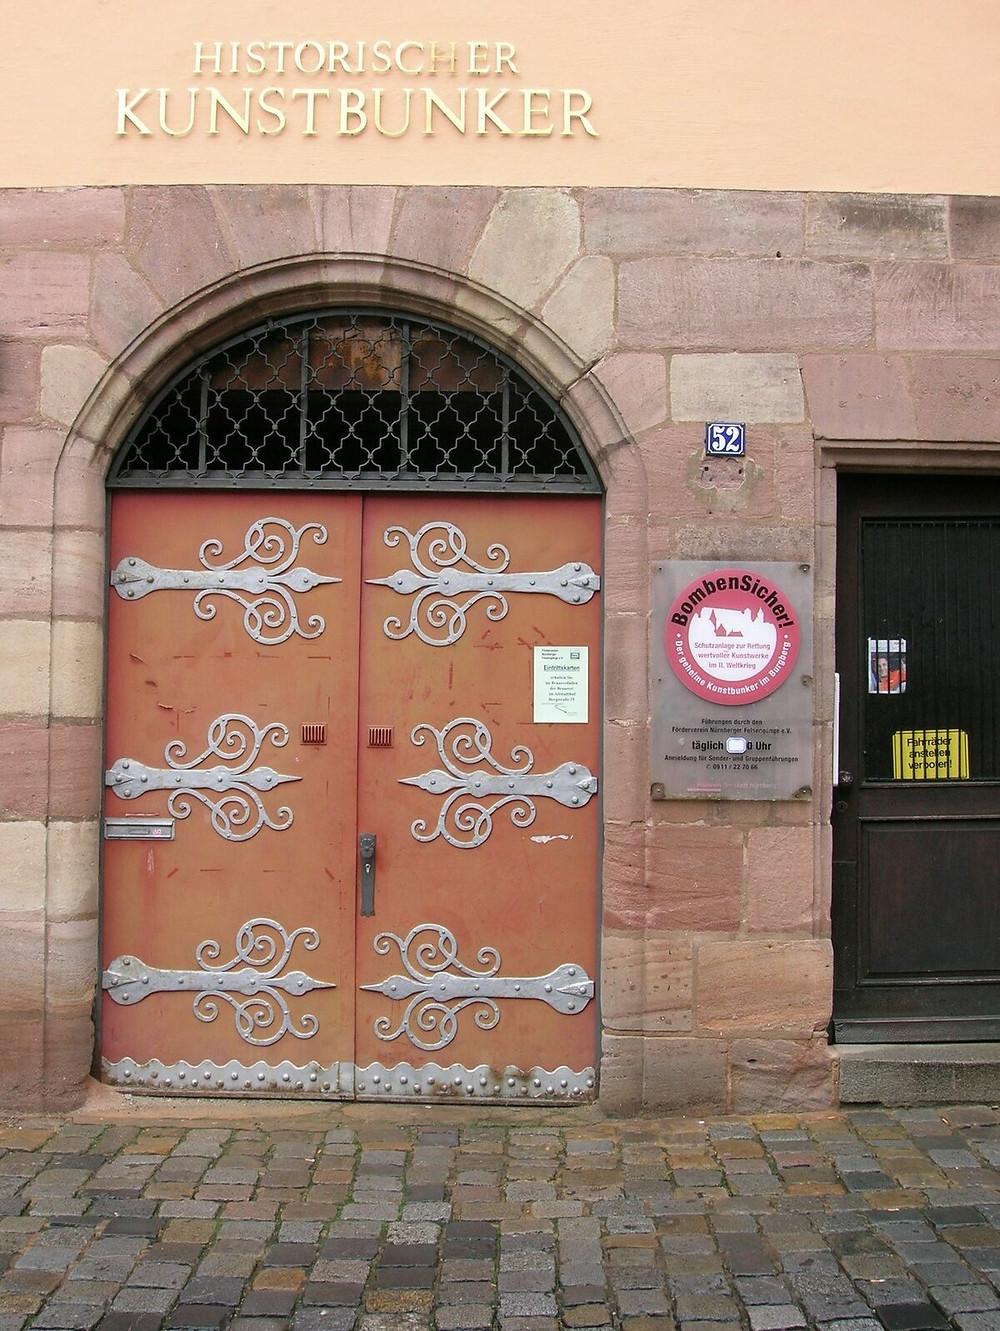 entrance to the Historischer Kunstbunier